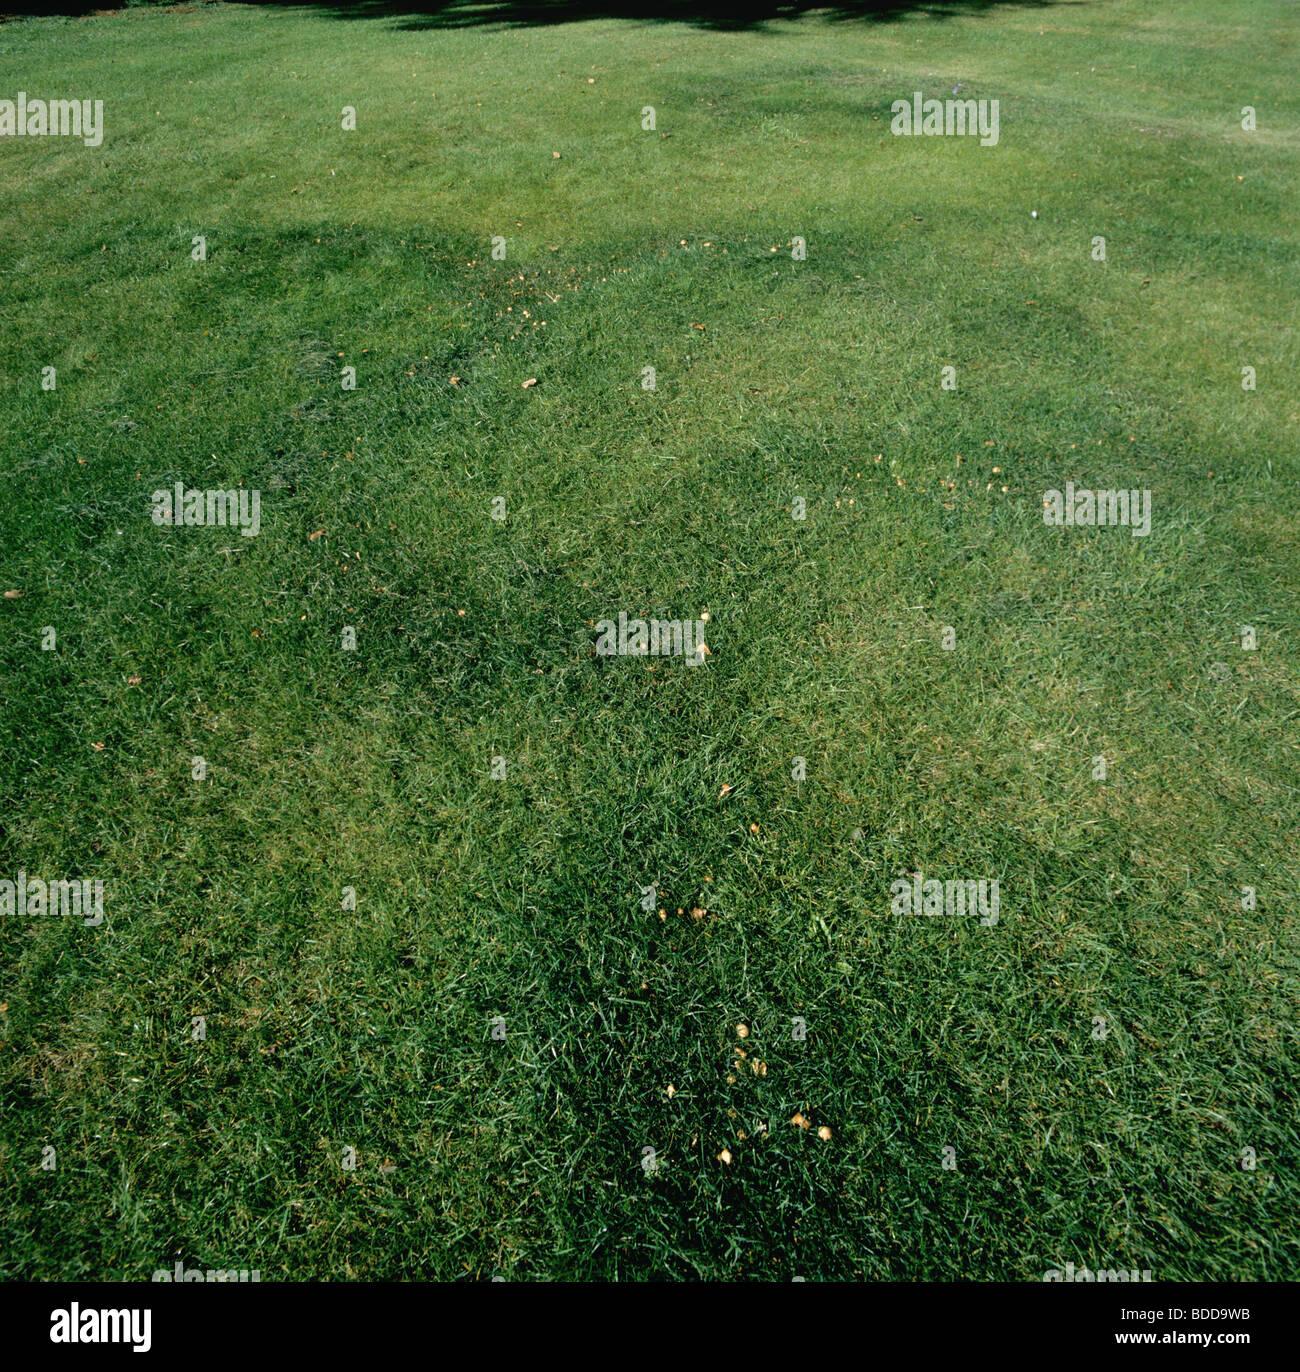 Fairy rings (Marasmius oreades) in lawn at Reading University - Stock Image